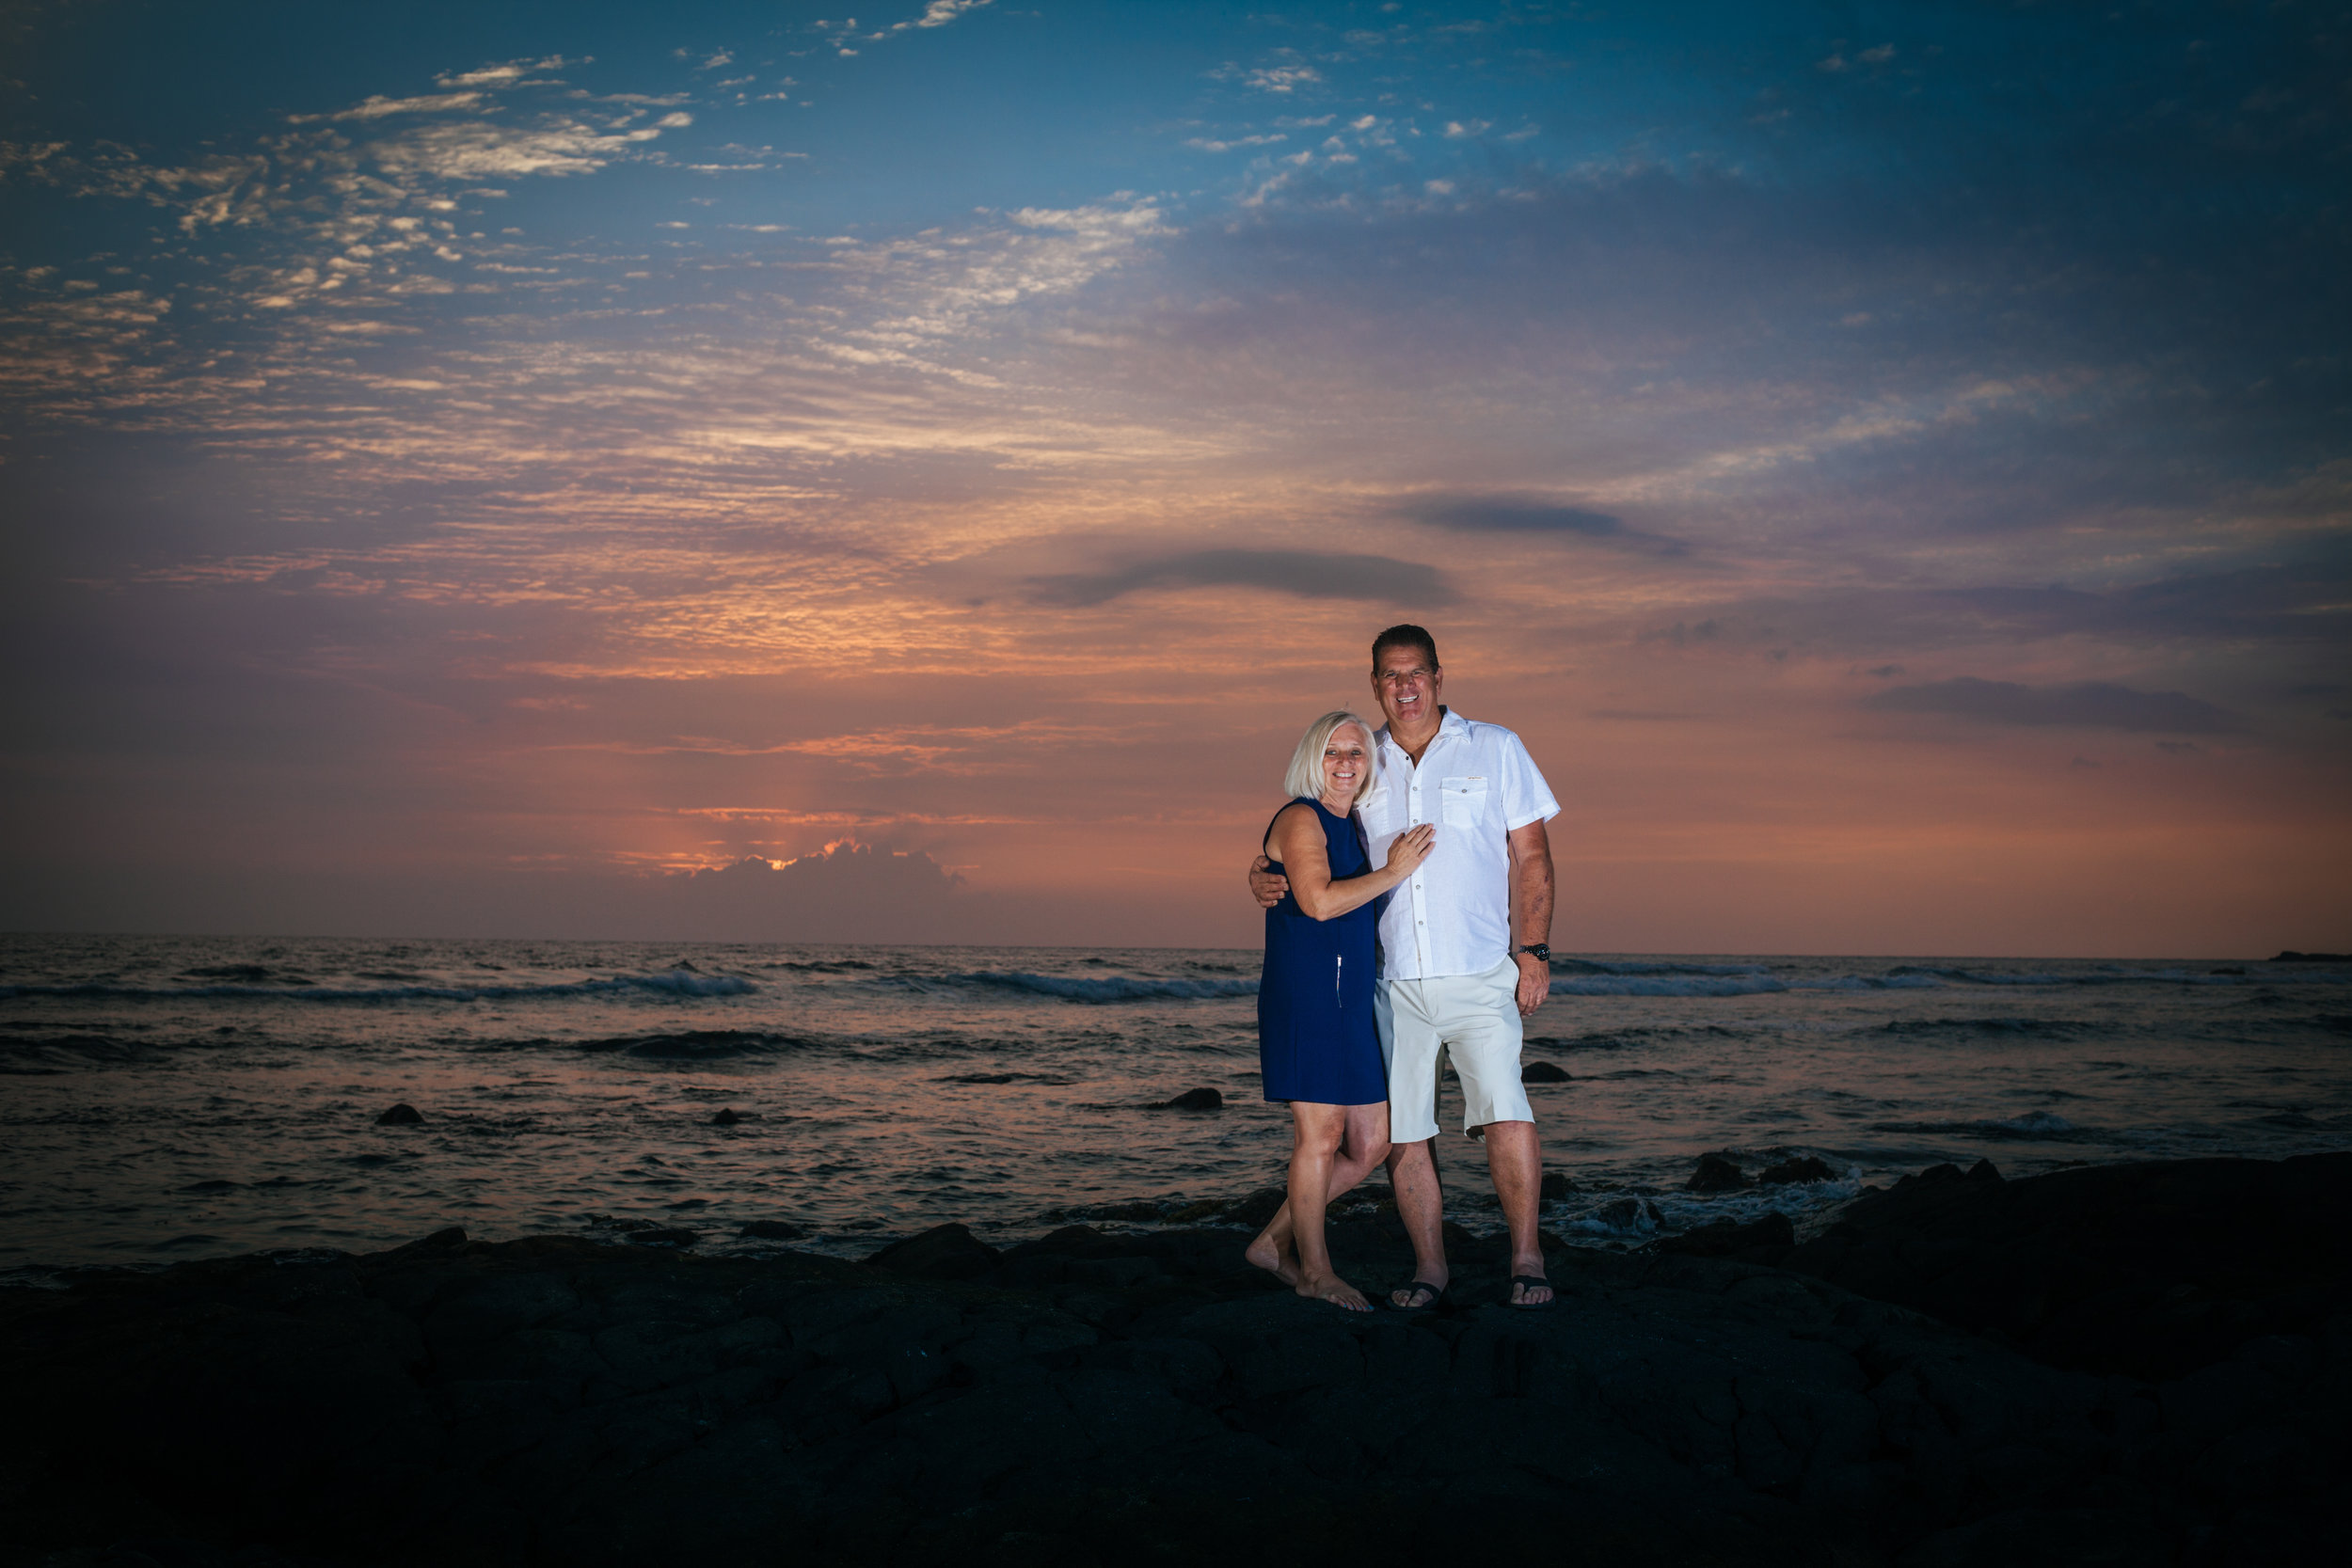 big island hawaii old kona airport beach family © kelilina photography 20170221182256.jpg